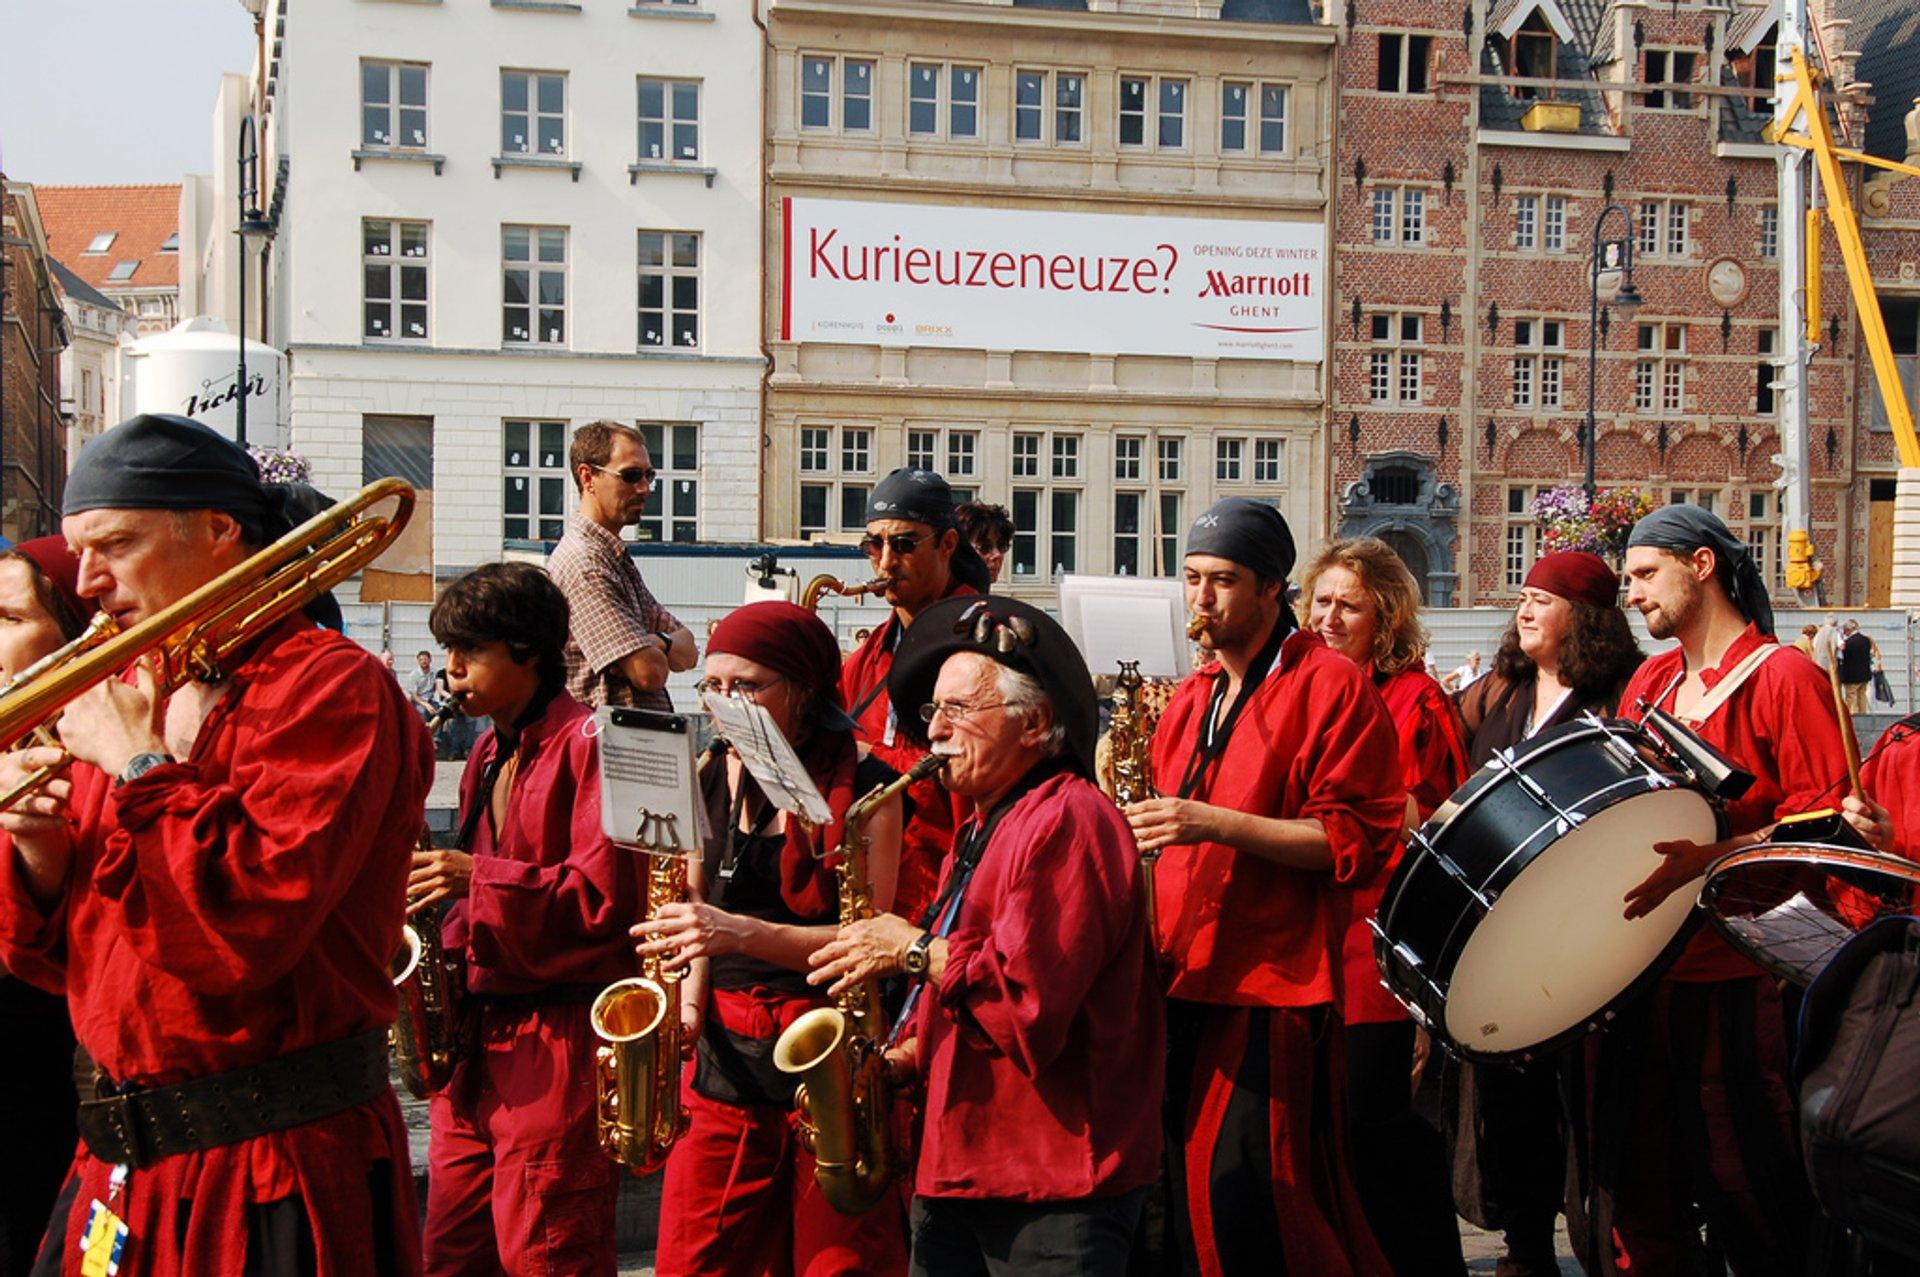 Ghent Festival of Flanders in Belgium 2020 - Best Time